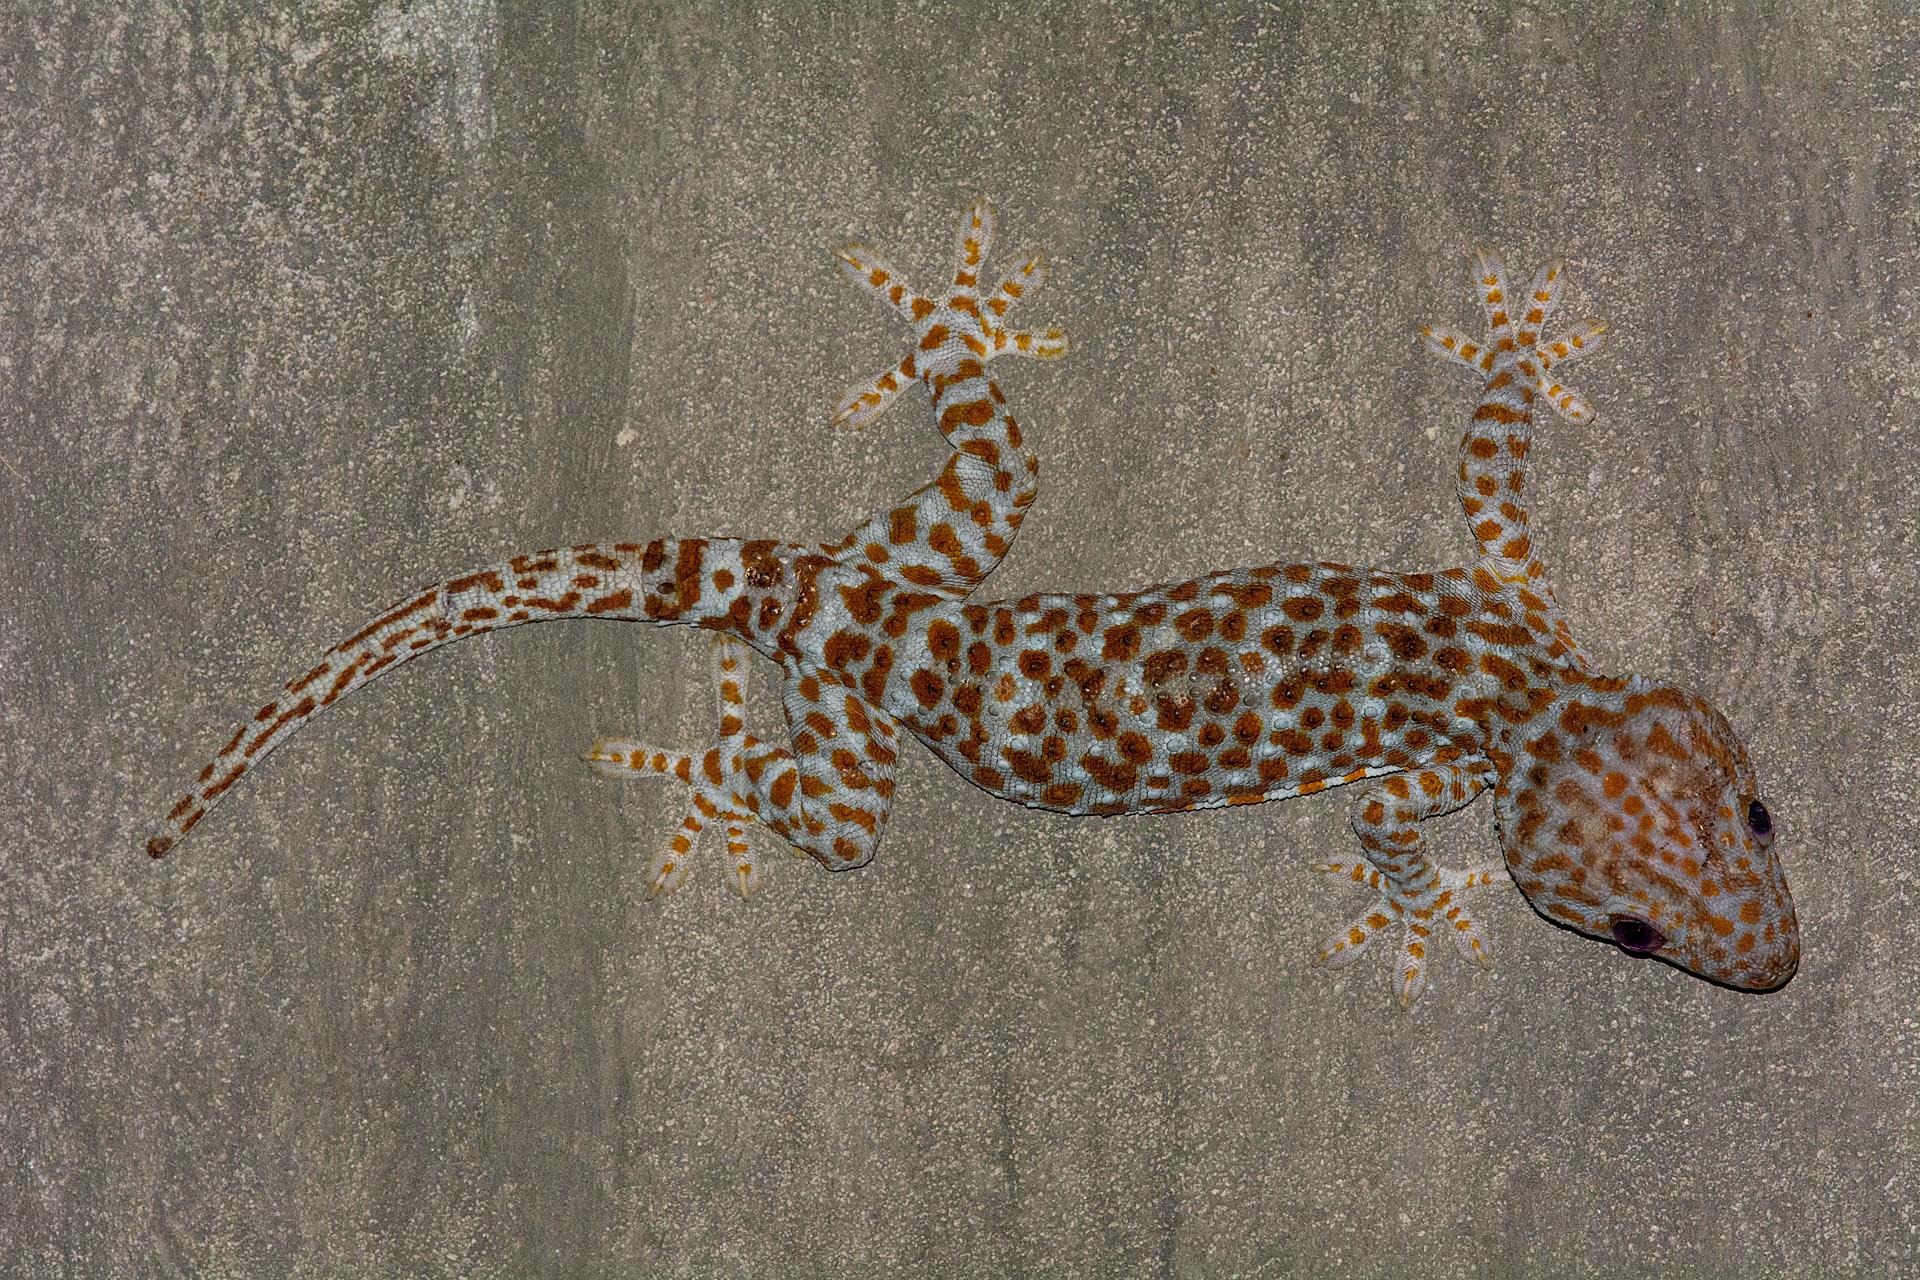 Tokay gecko ('Short Tail')